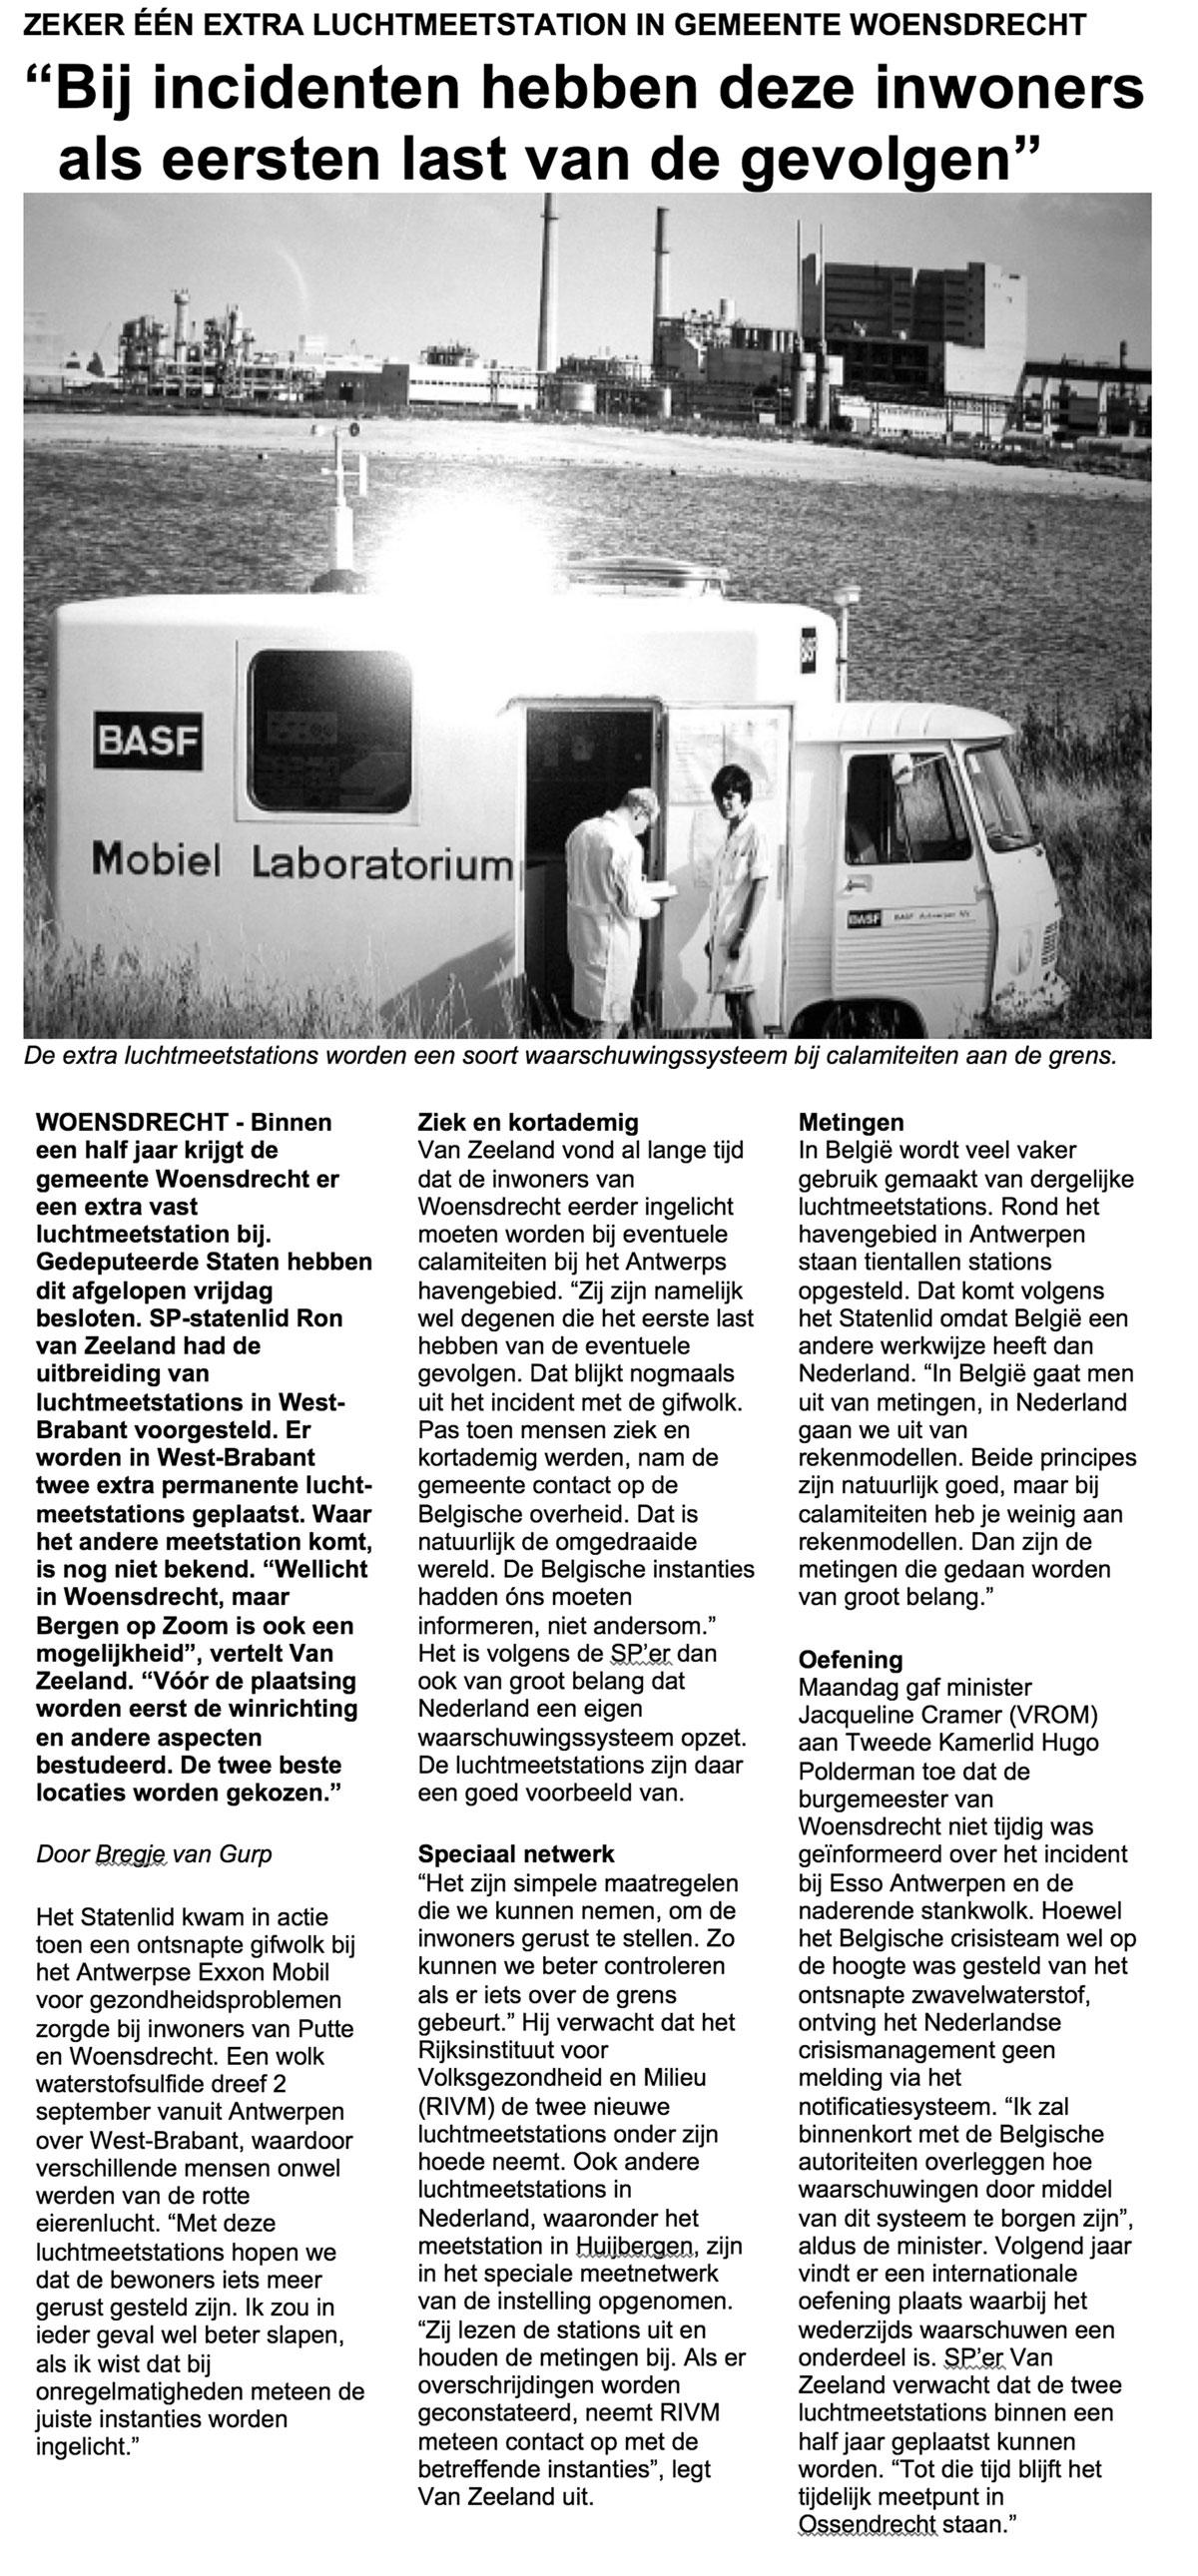 Brabant - luchtkwaliteit - West-brabant - Ron van Zeeland